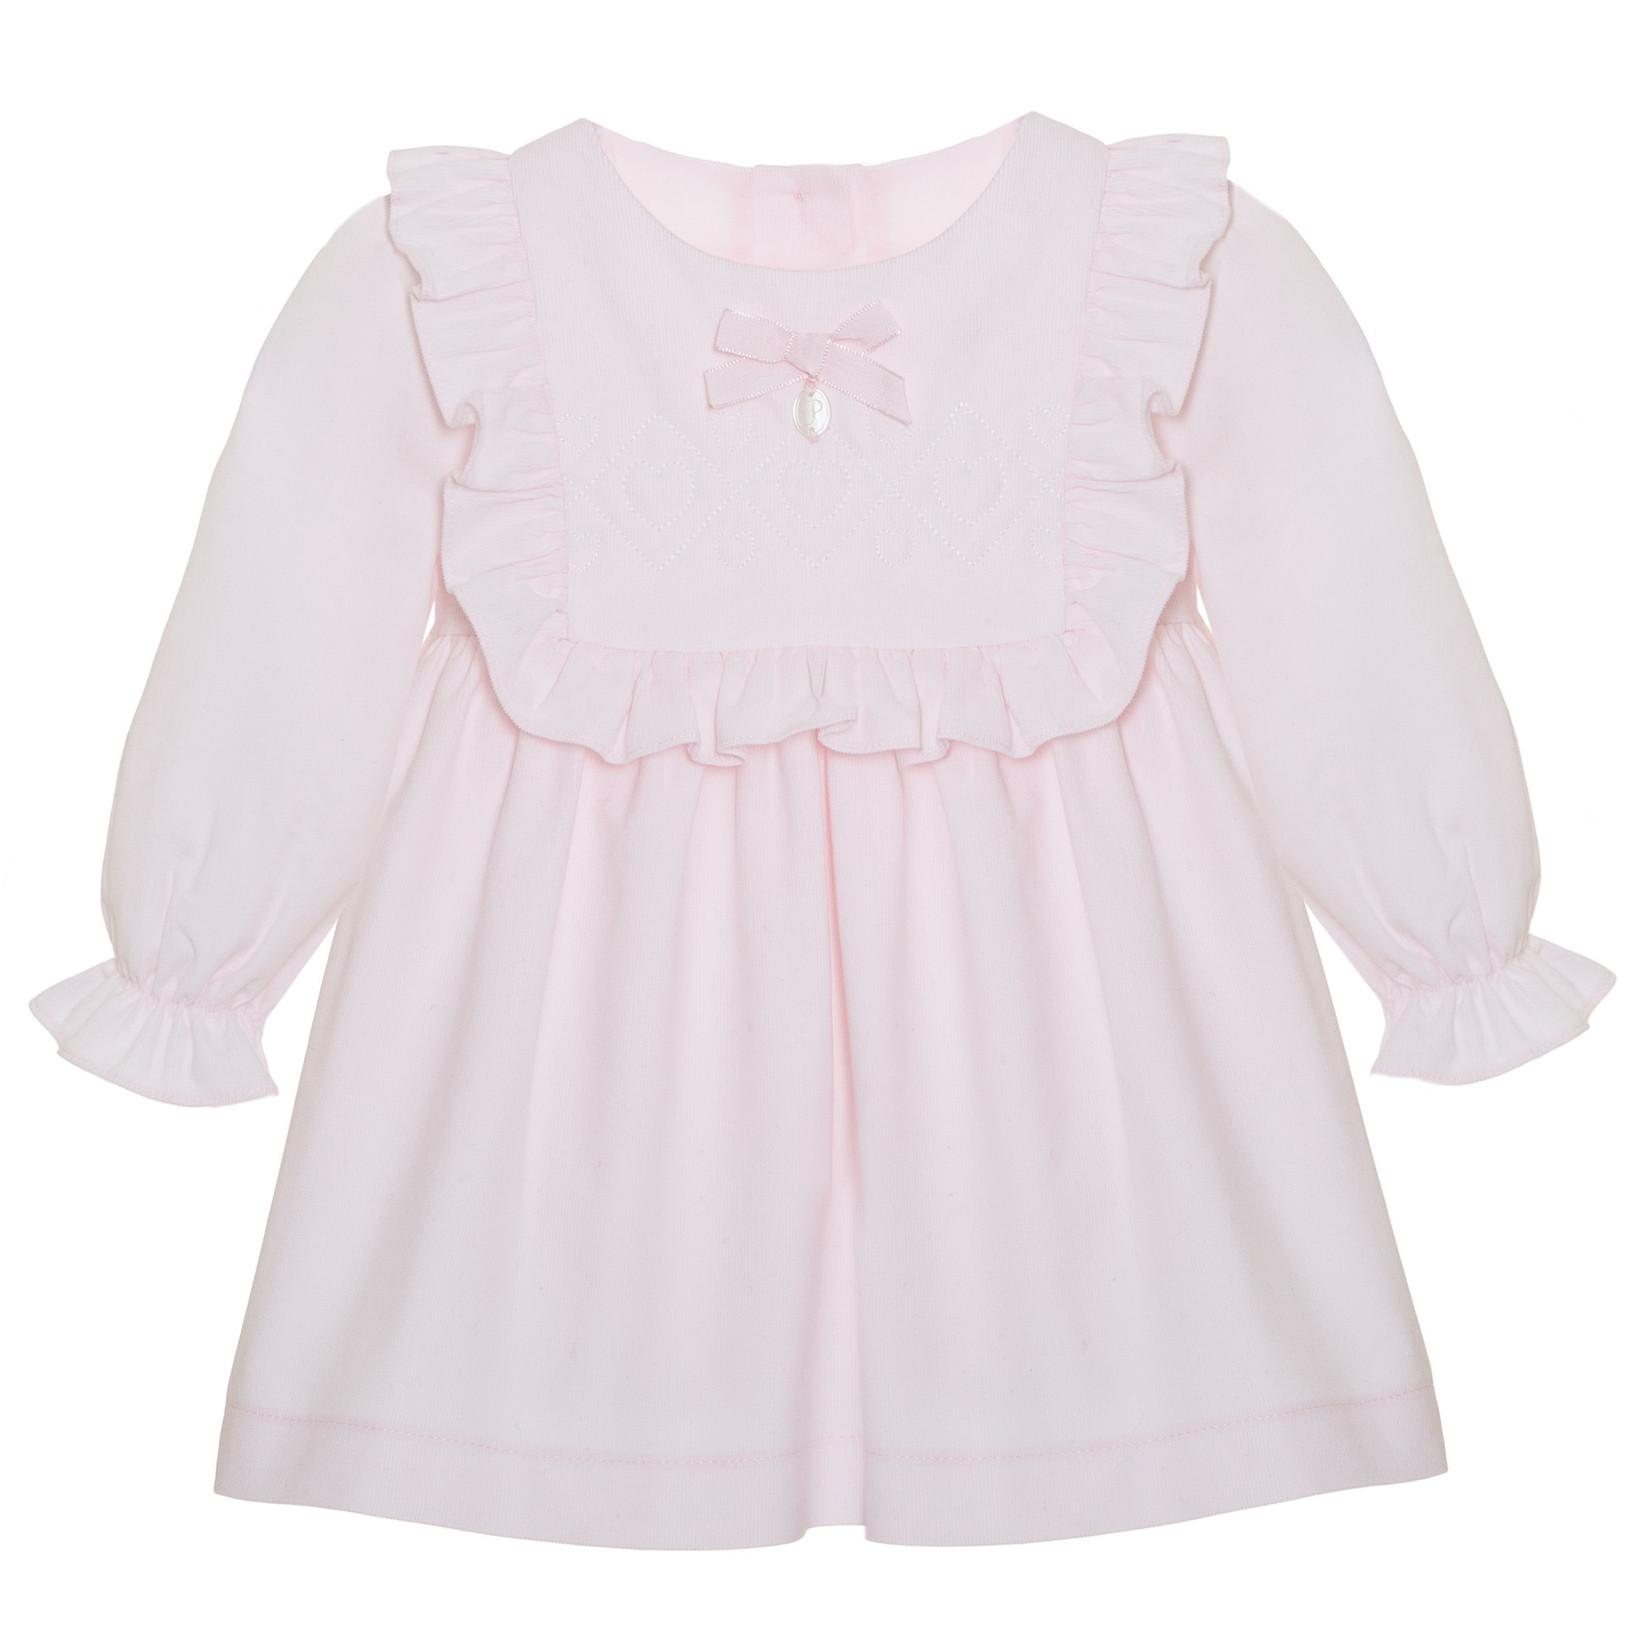 Patachou Dress Gigi - Patachou